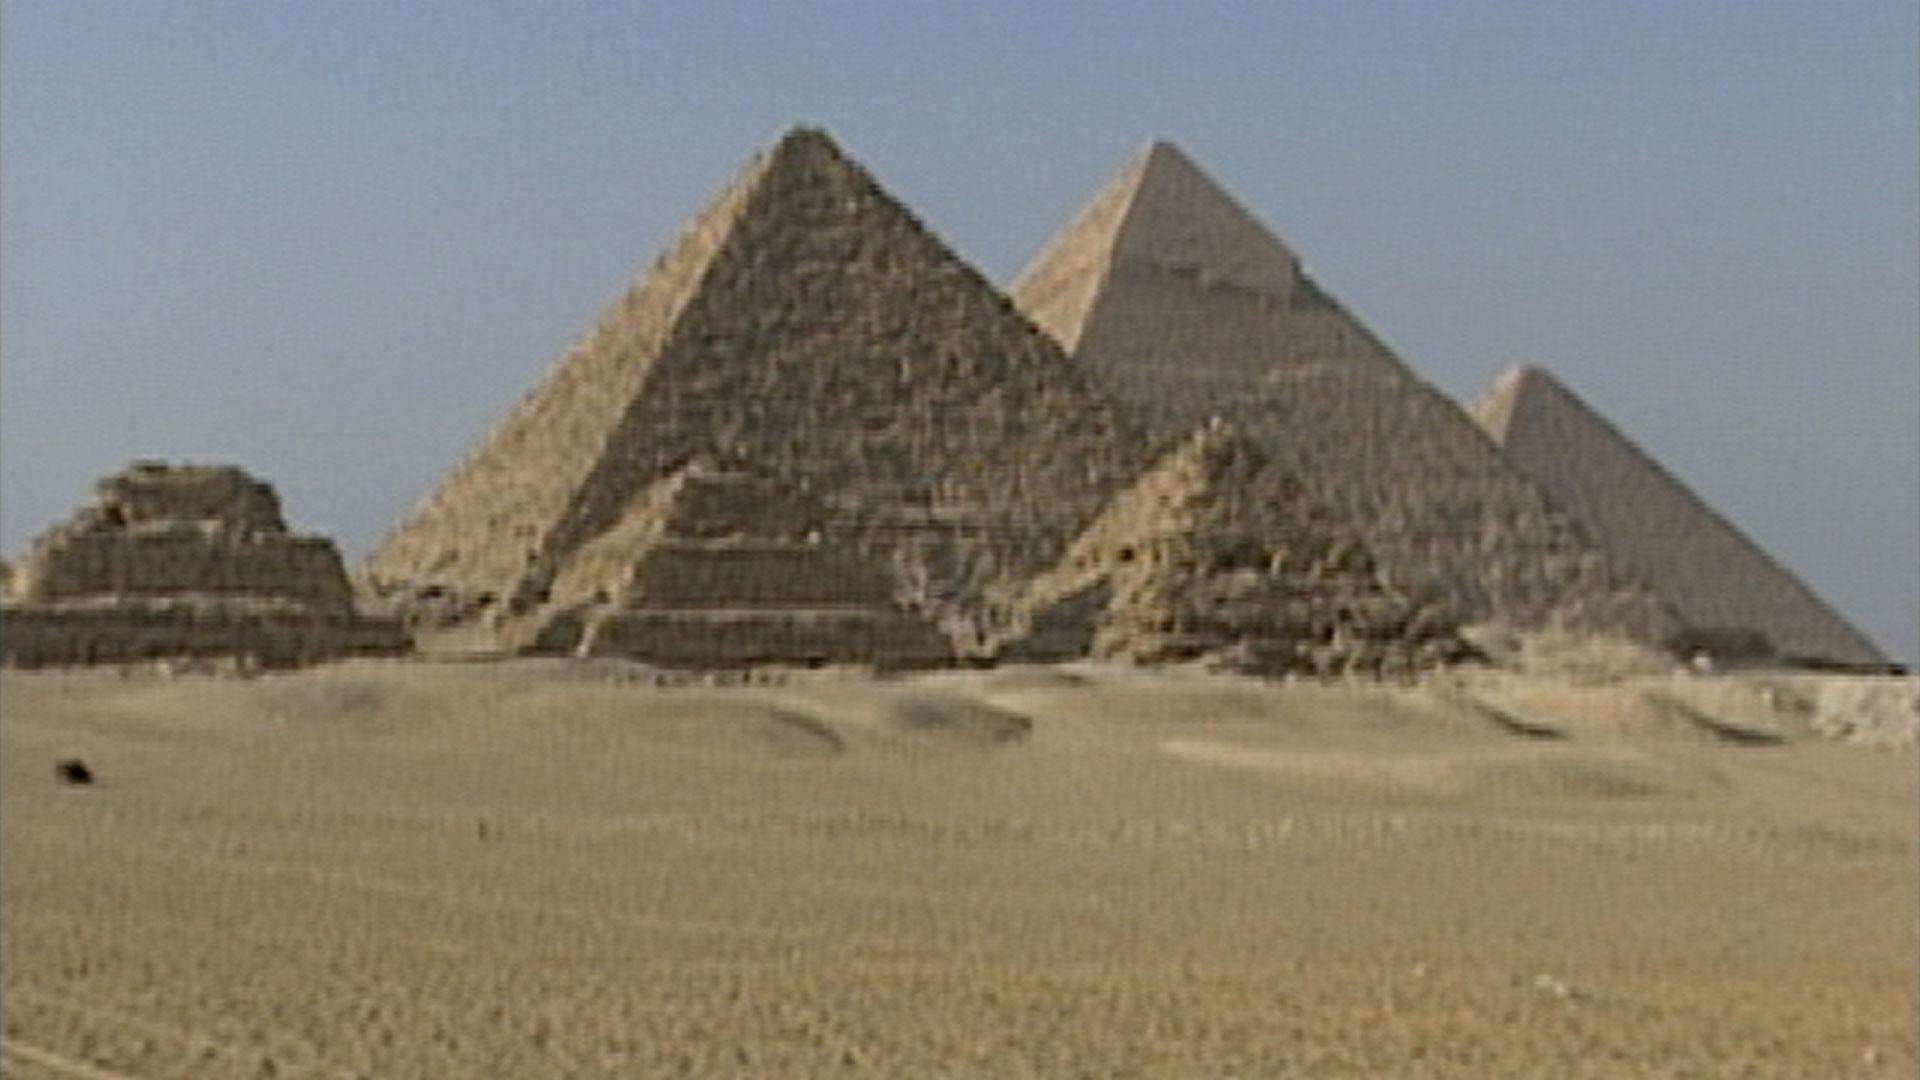 Pyramids: Majesty and Mystery